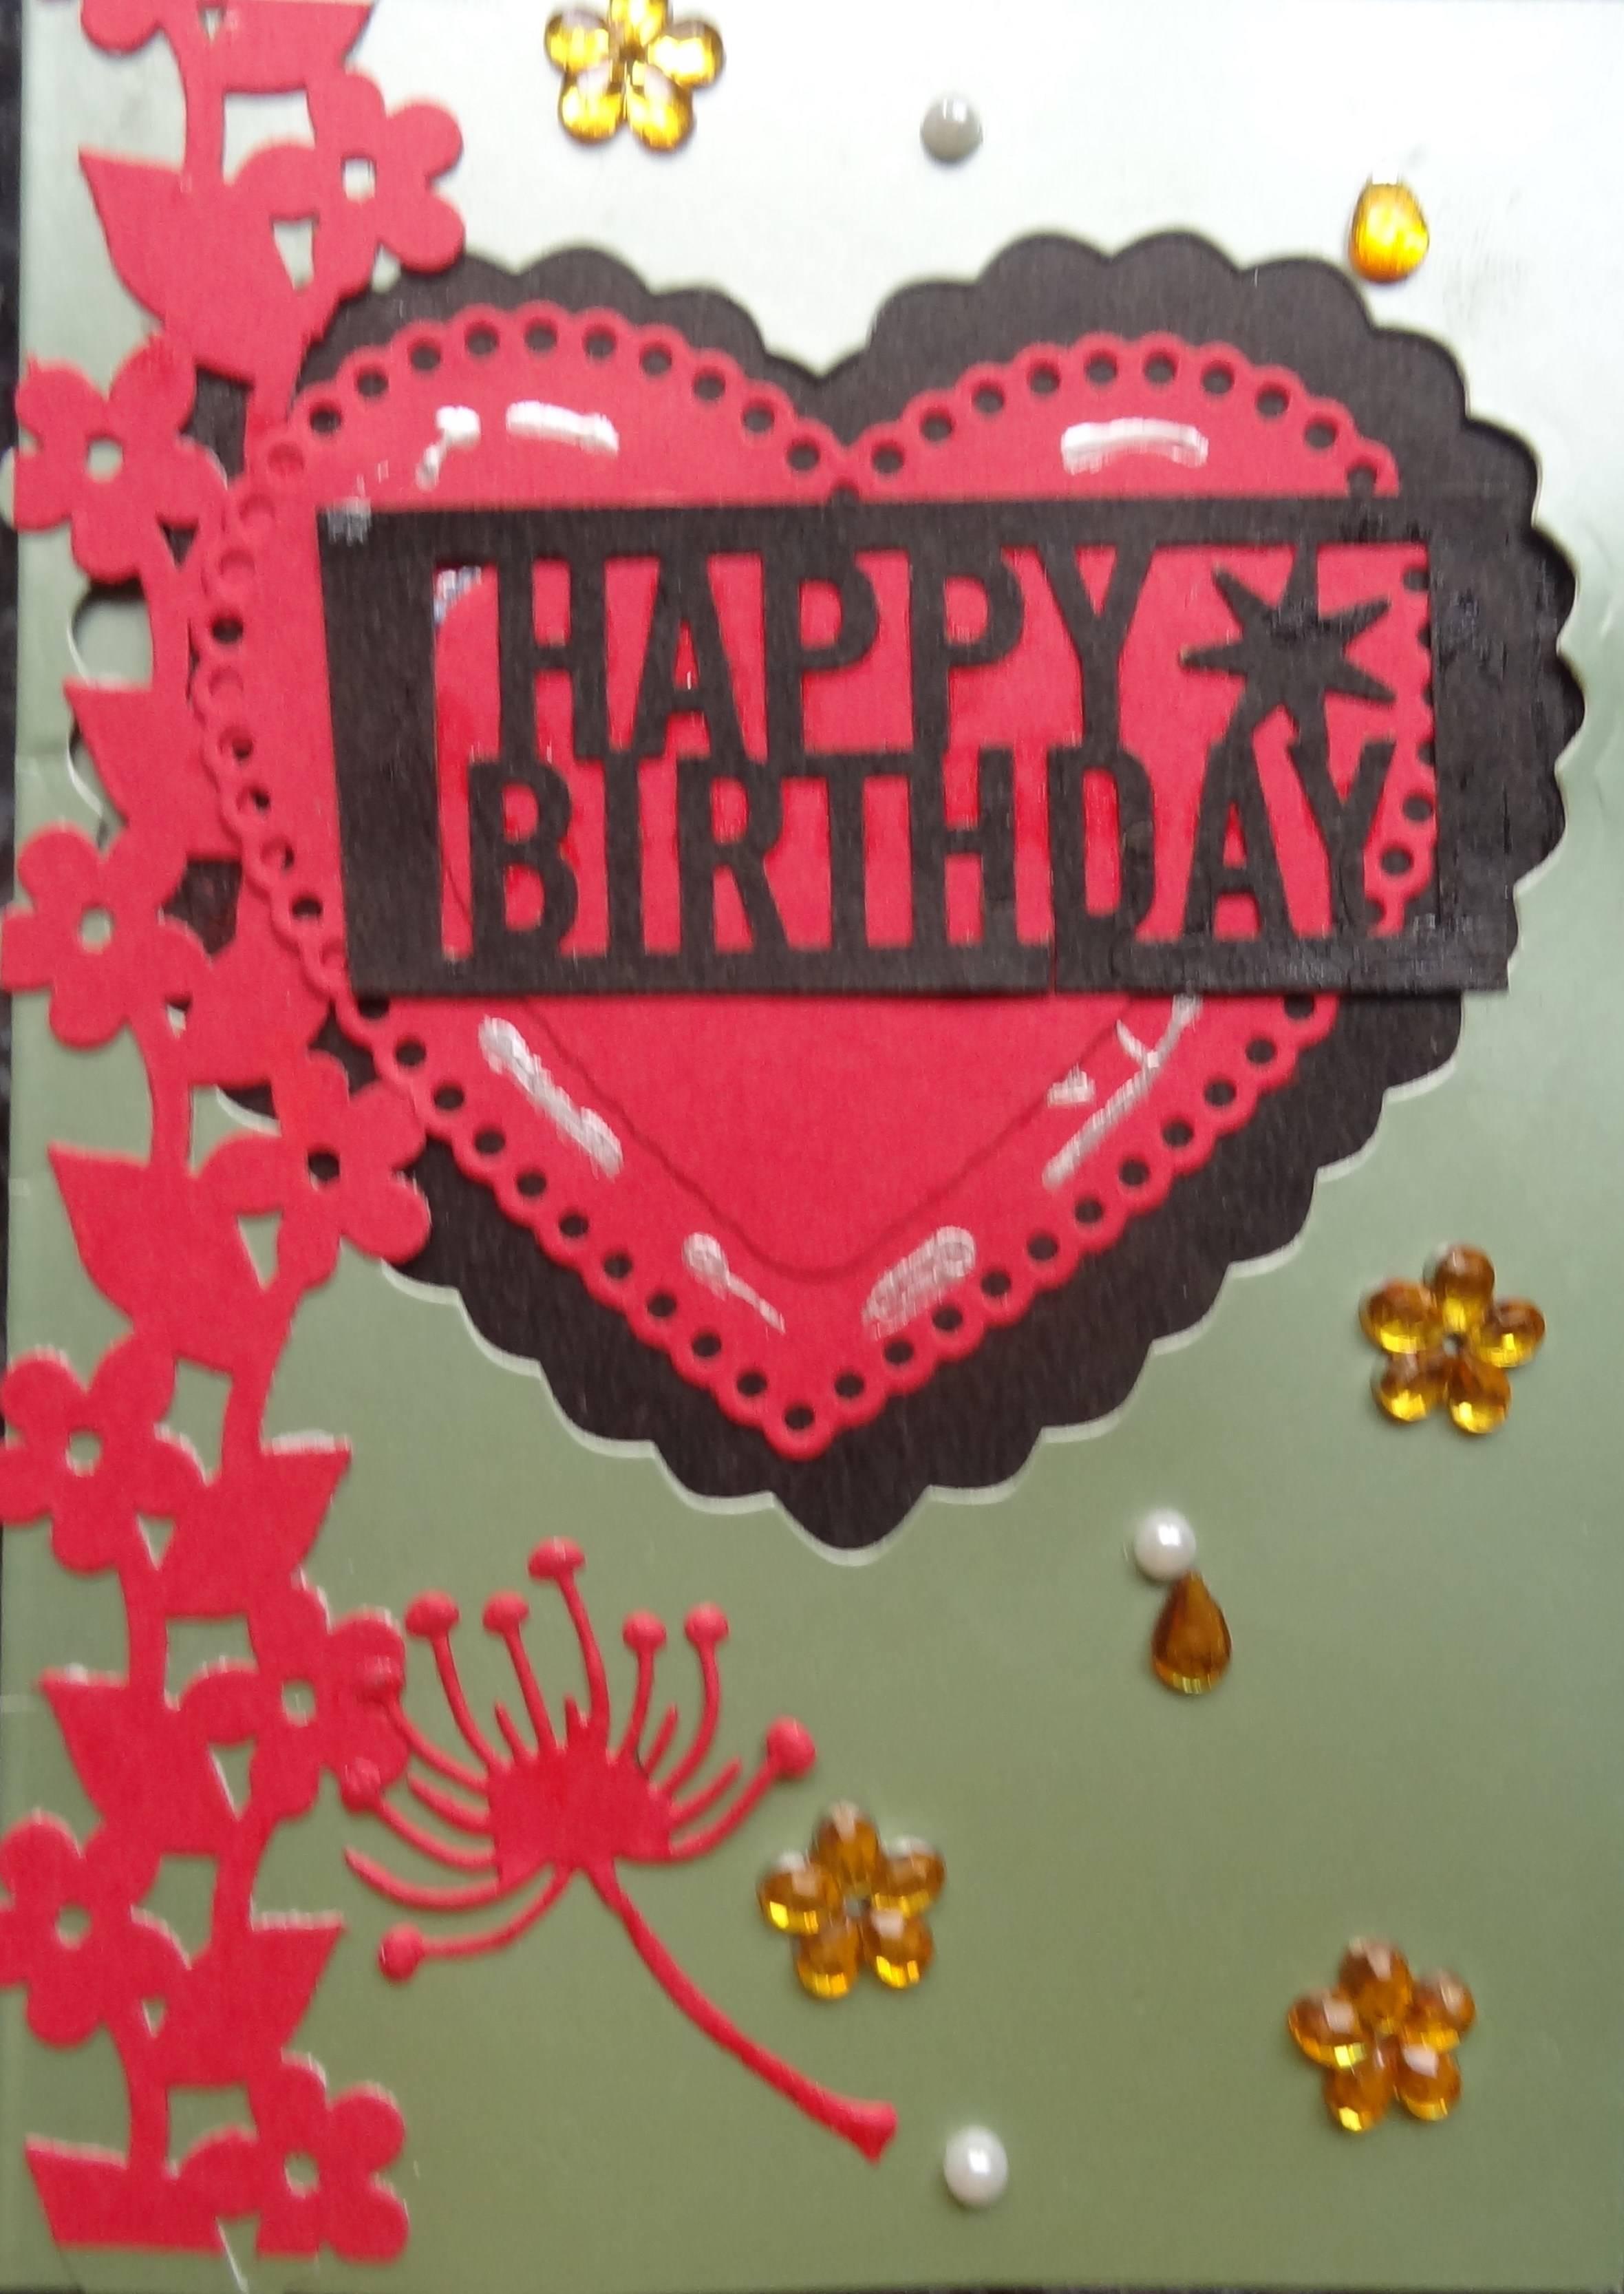 Buy Ethnic handmade birthday card ShipMyCardCom – Ethnic Birthday Cards